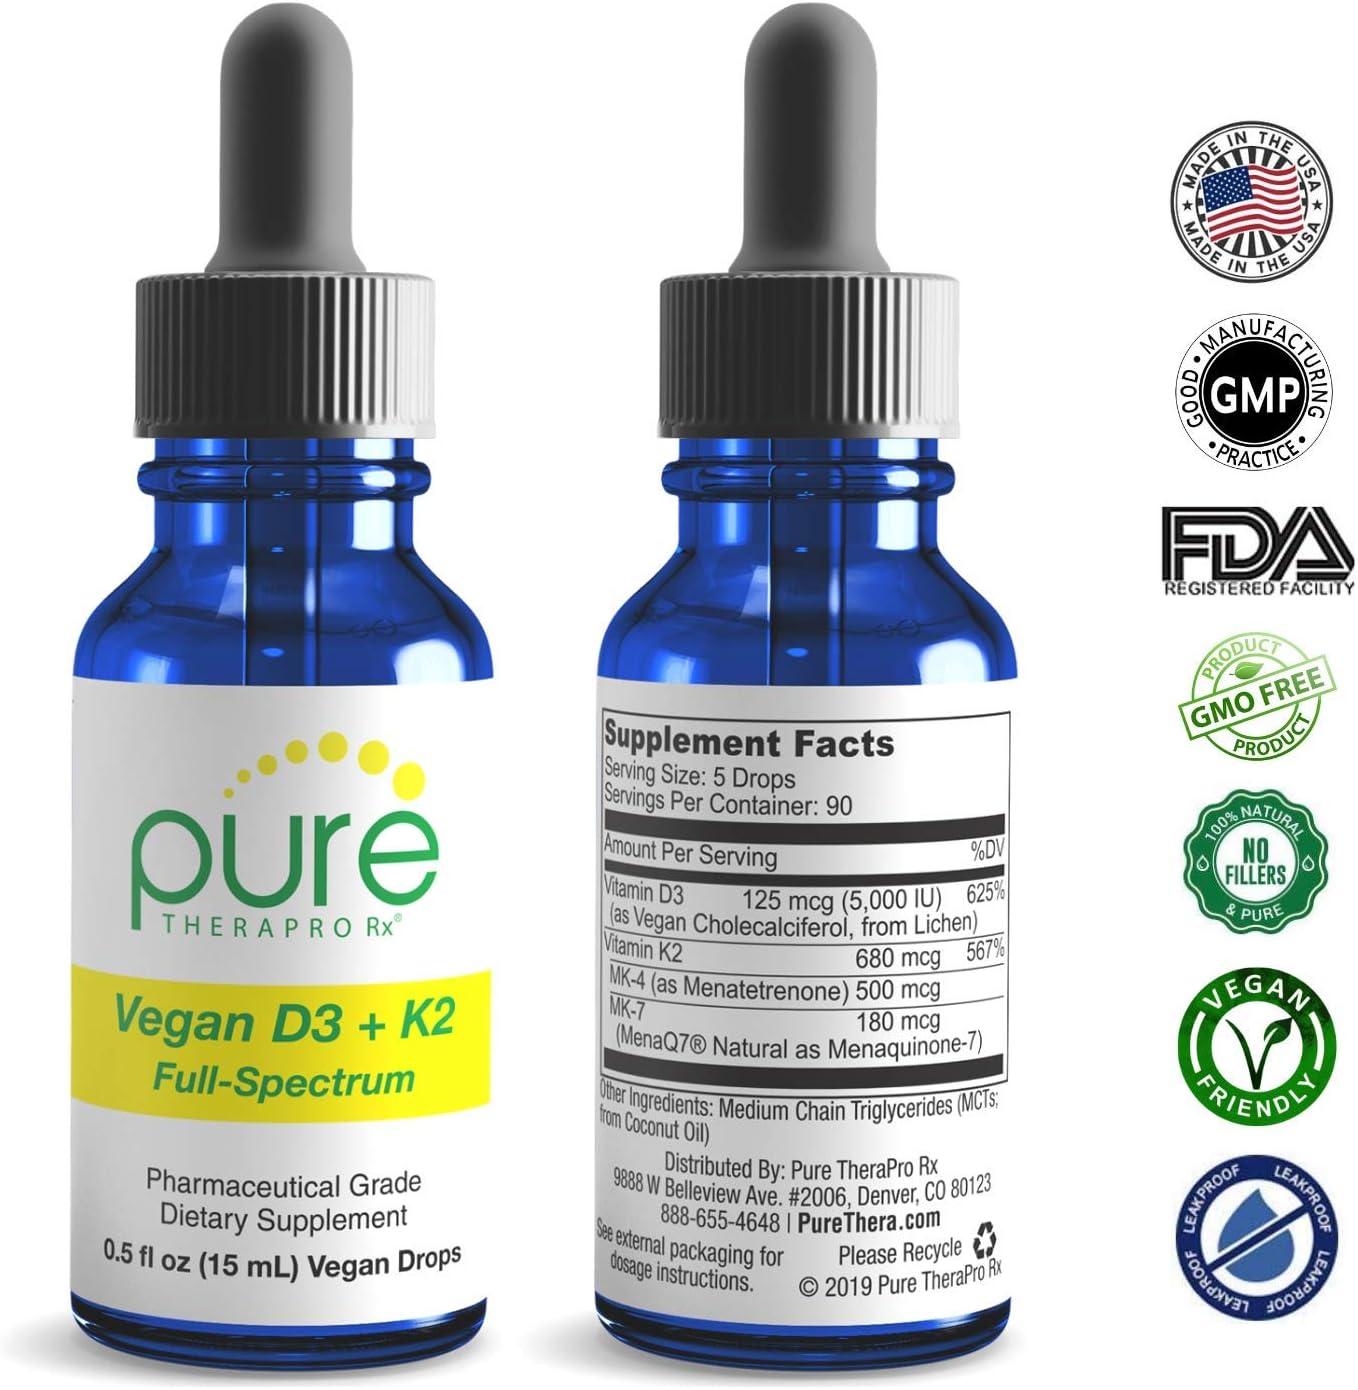 "Vegan D3 + K2 ""Full Spectrum"" Drops for Best Absorption | 5 Drops Contain: 5,000iu VIT D3 ""pureshine"", 500mcg VIT K2 (MK4) & 180mcg VIT K2 (MK7) ""MenaQ7"" | Soy-Free, GF, Non-GMO, Tasteless & Odorless: Health & Personal Care"